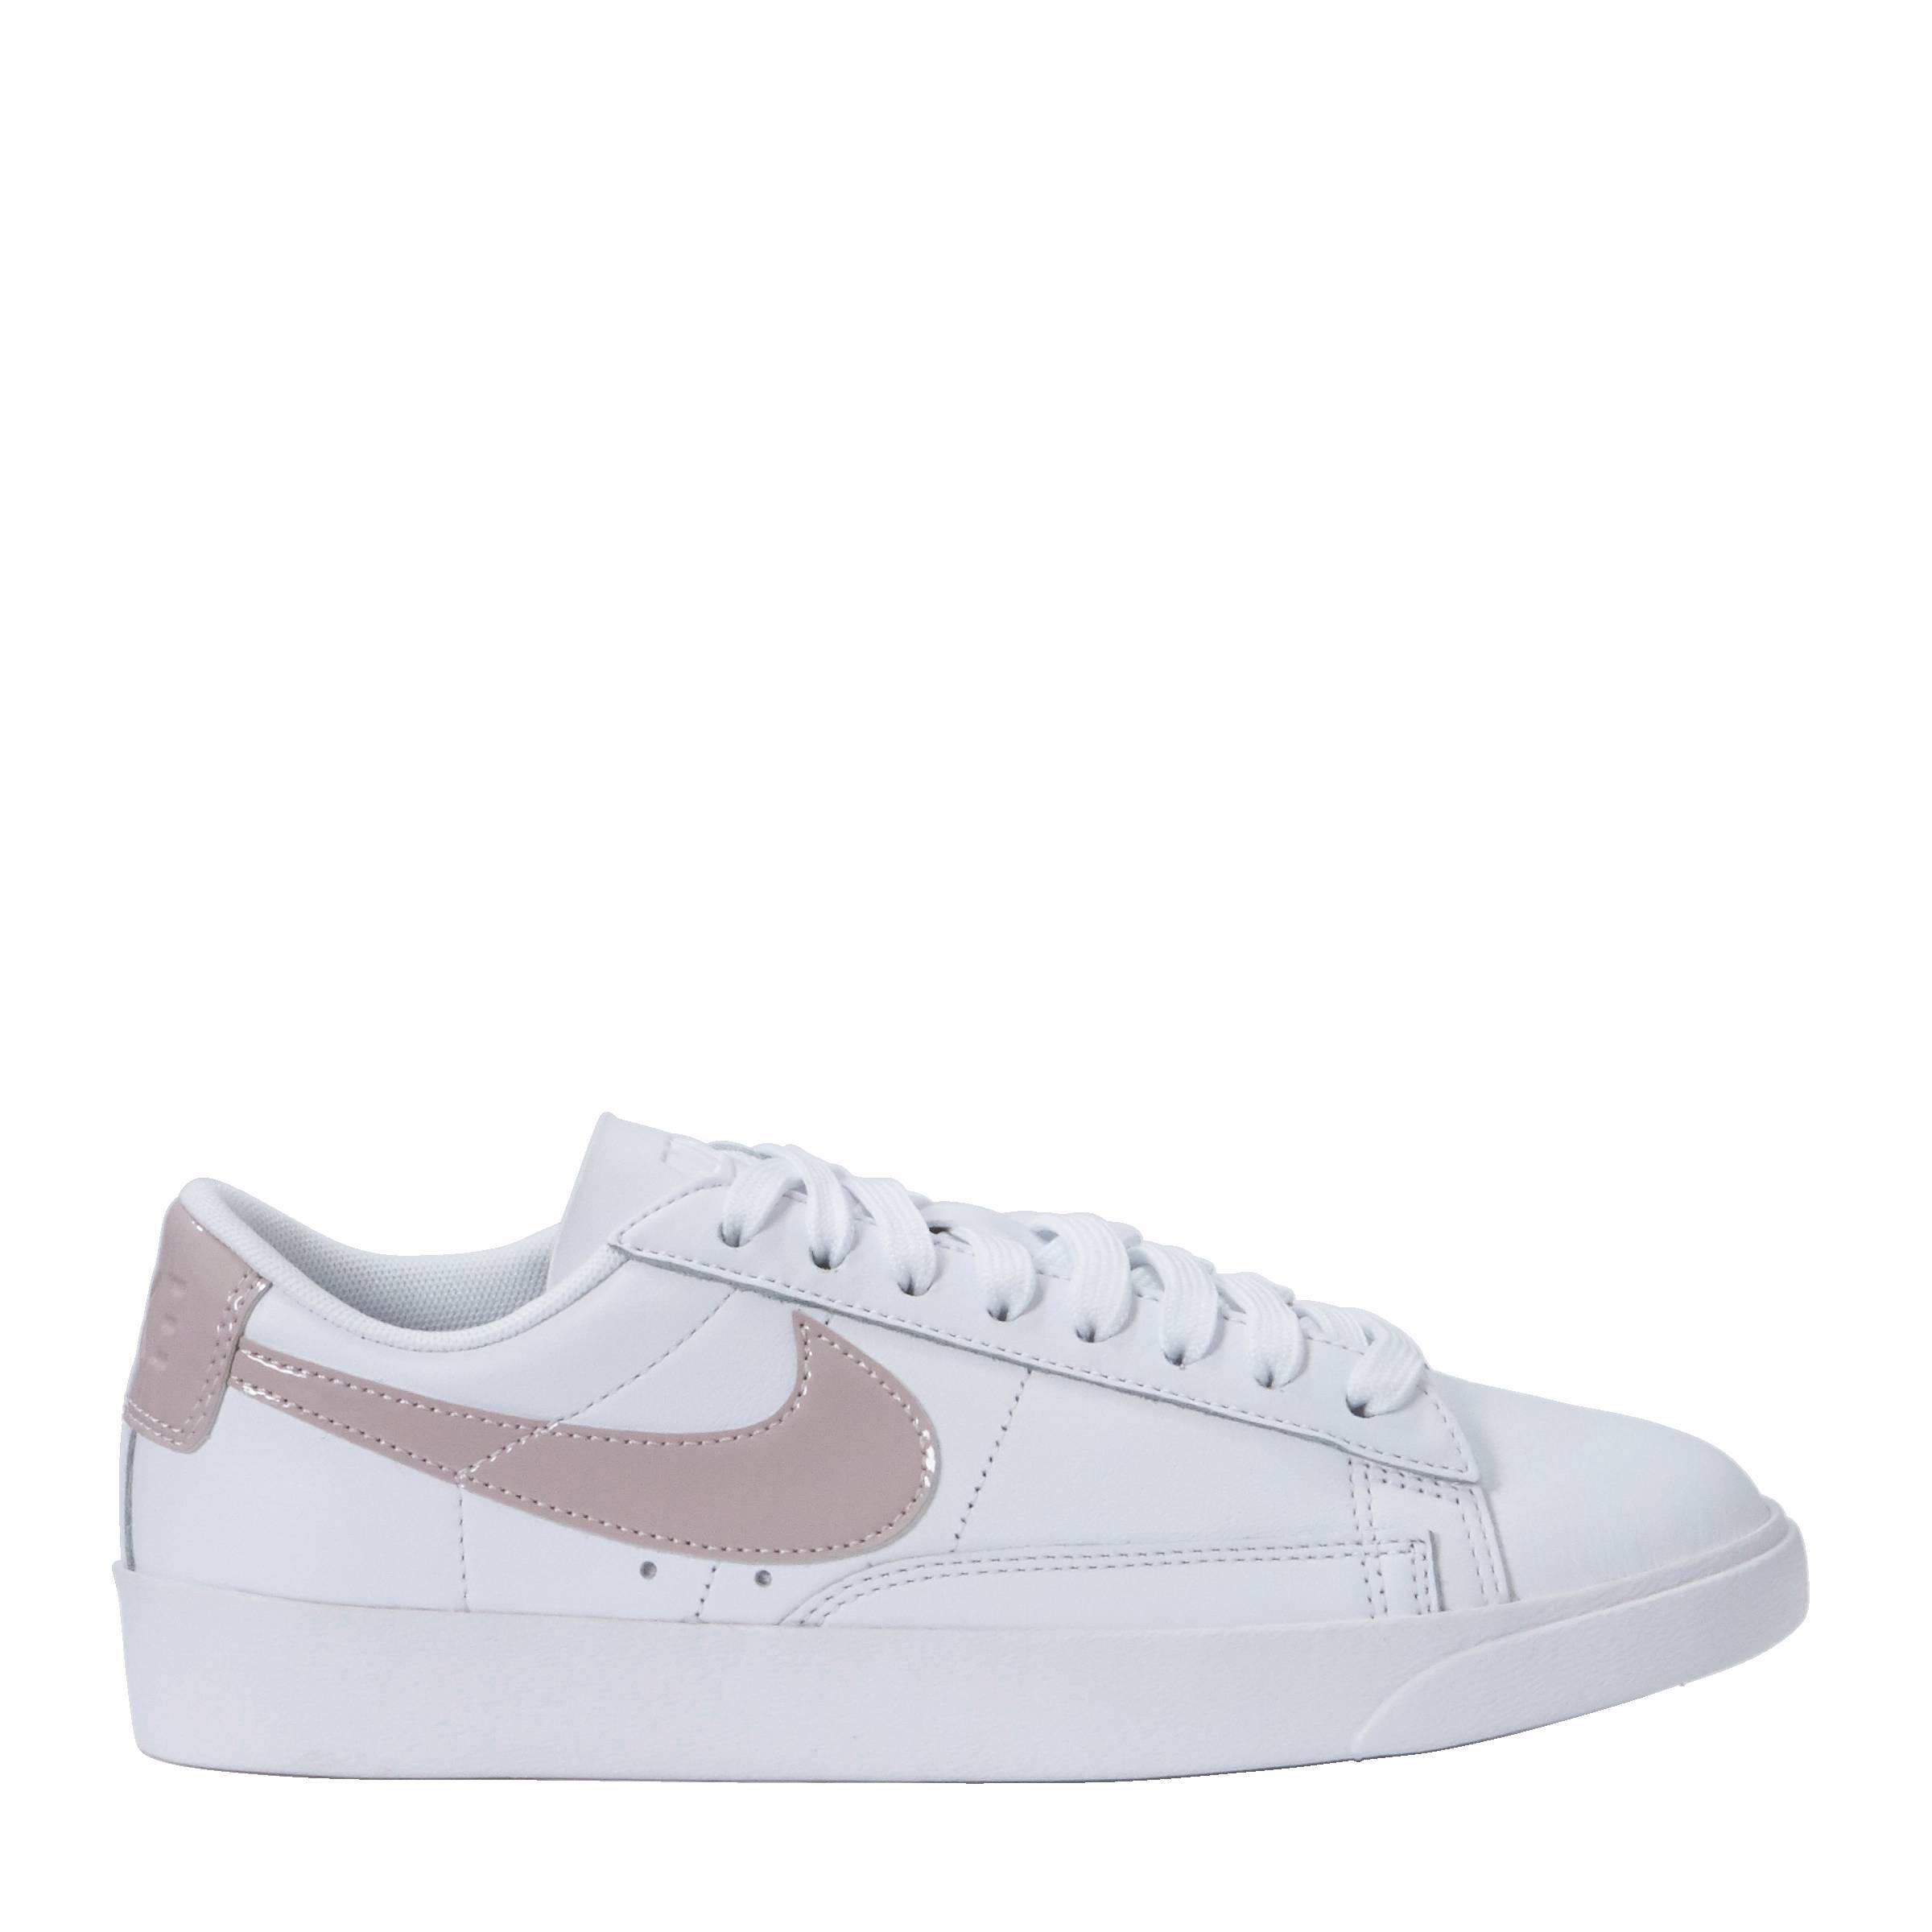 finest selection eb50e e5563 Nike Blazer Low LE sneakers   wehkamp